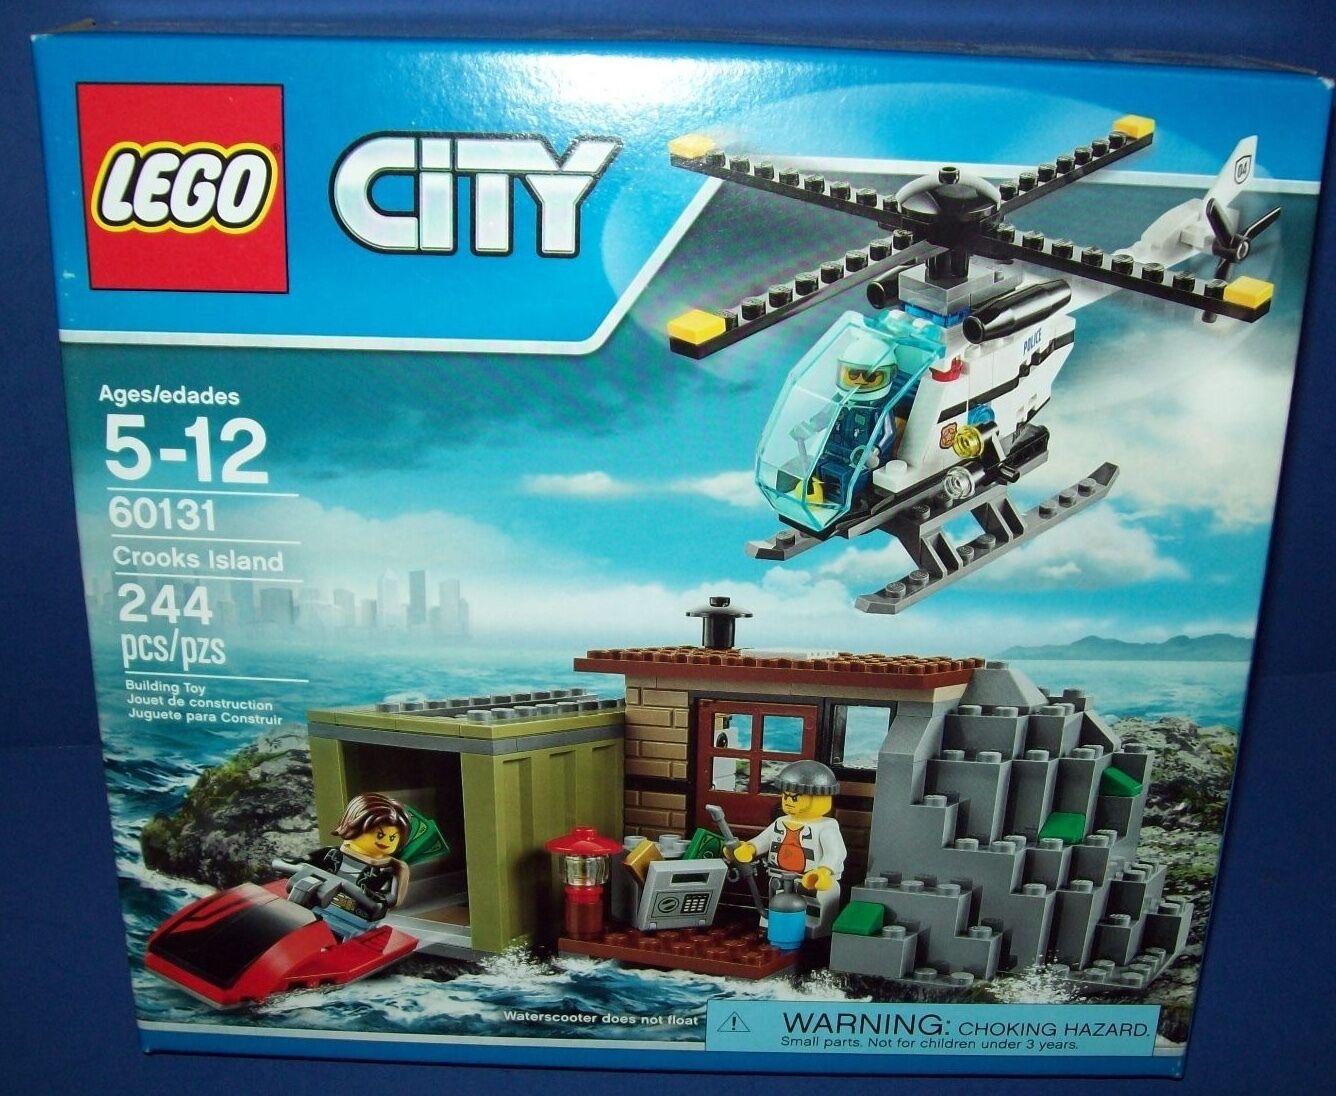 LEGO City 60131 CROOKS ISLAND retired